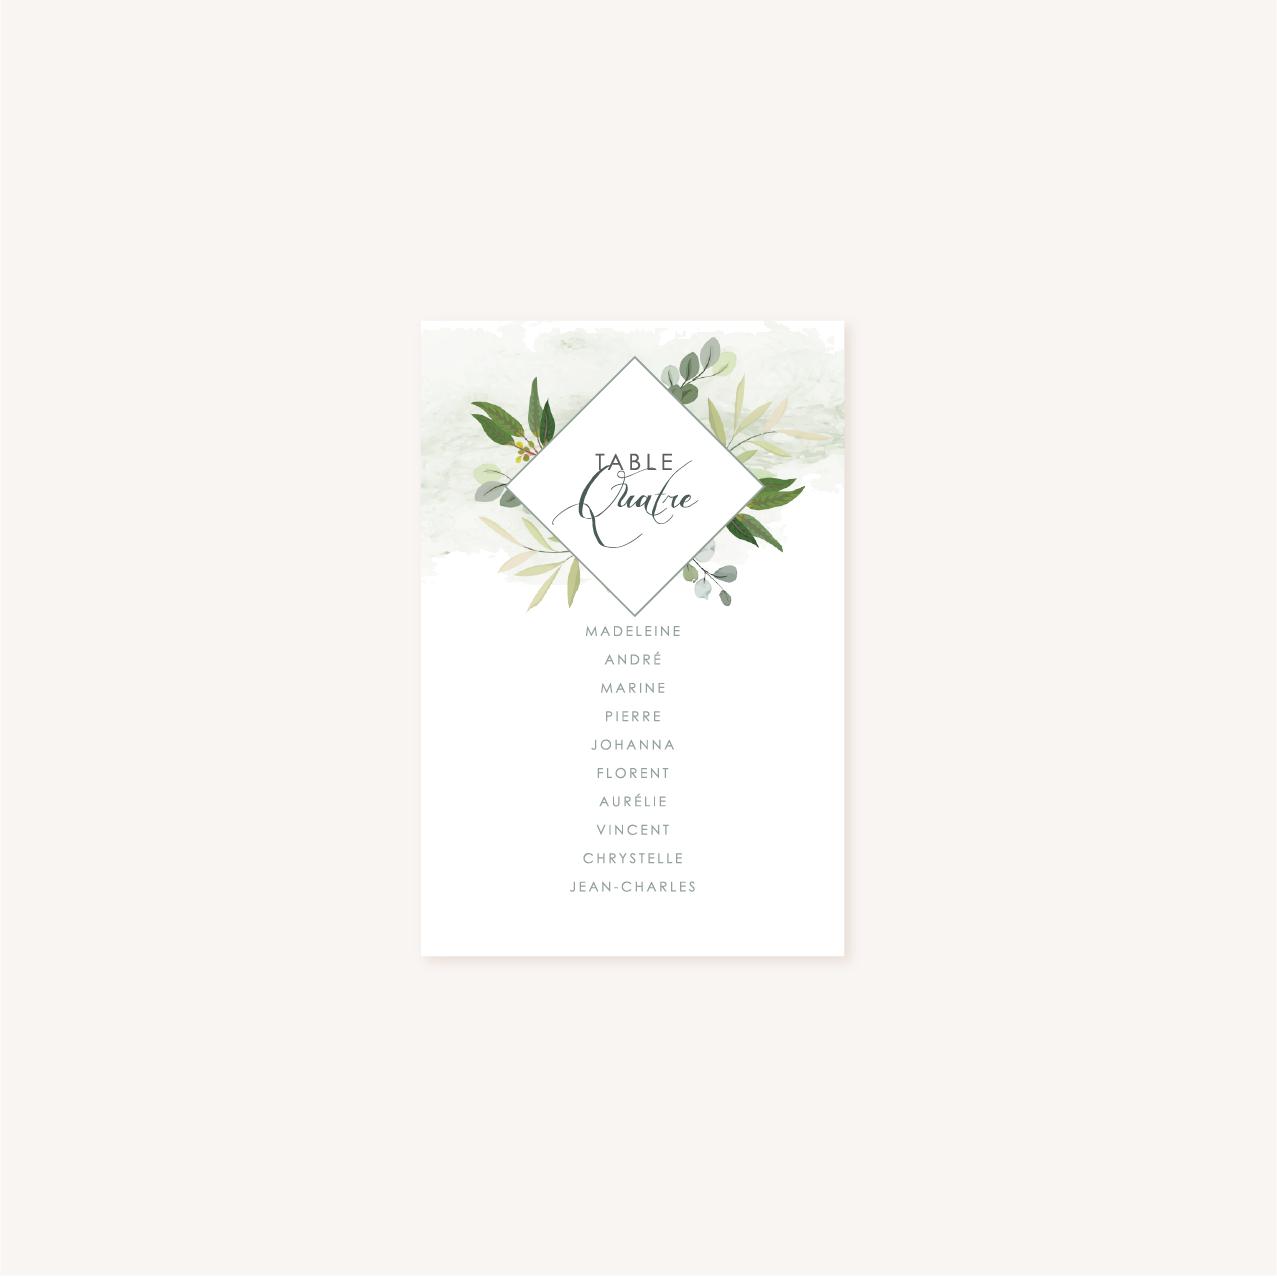 Plan de table blanc mariage végétal feuille eucalyptus